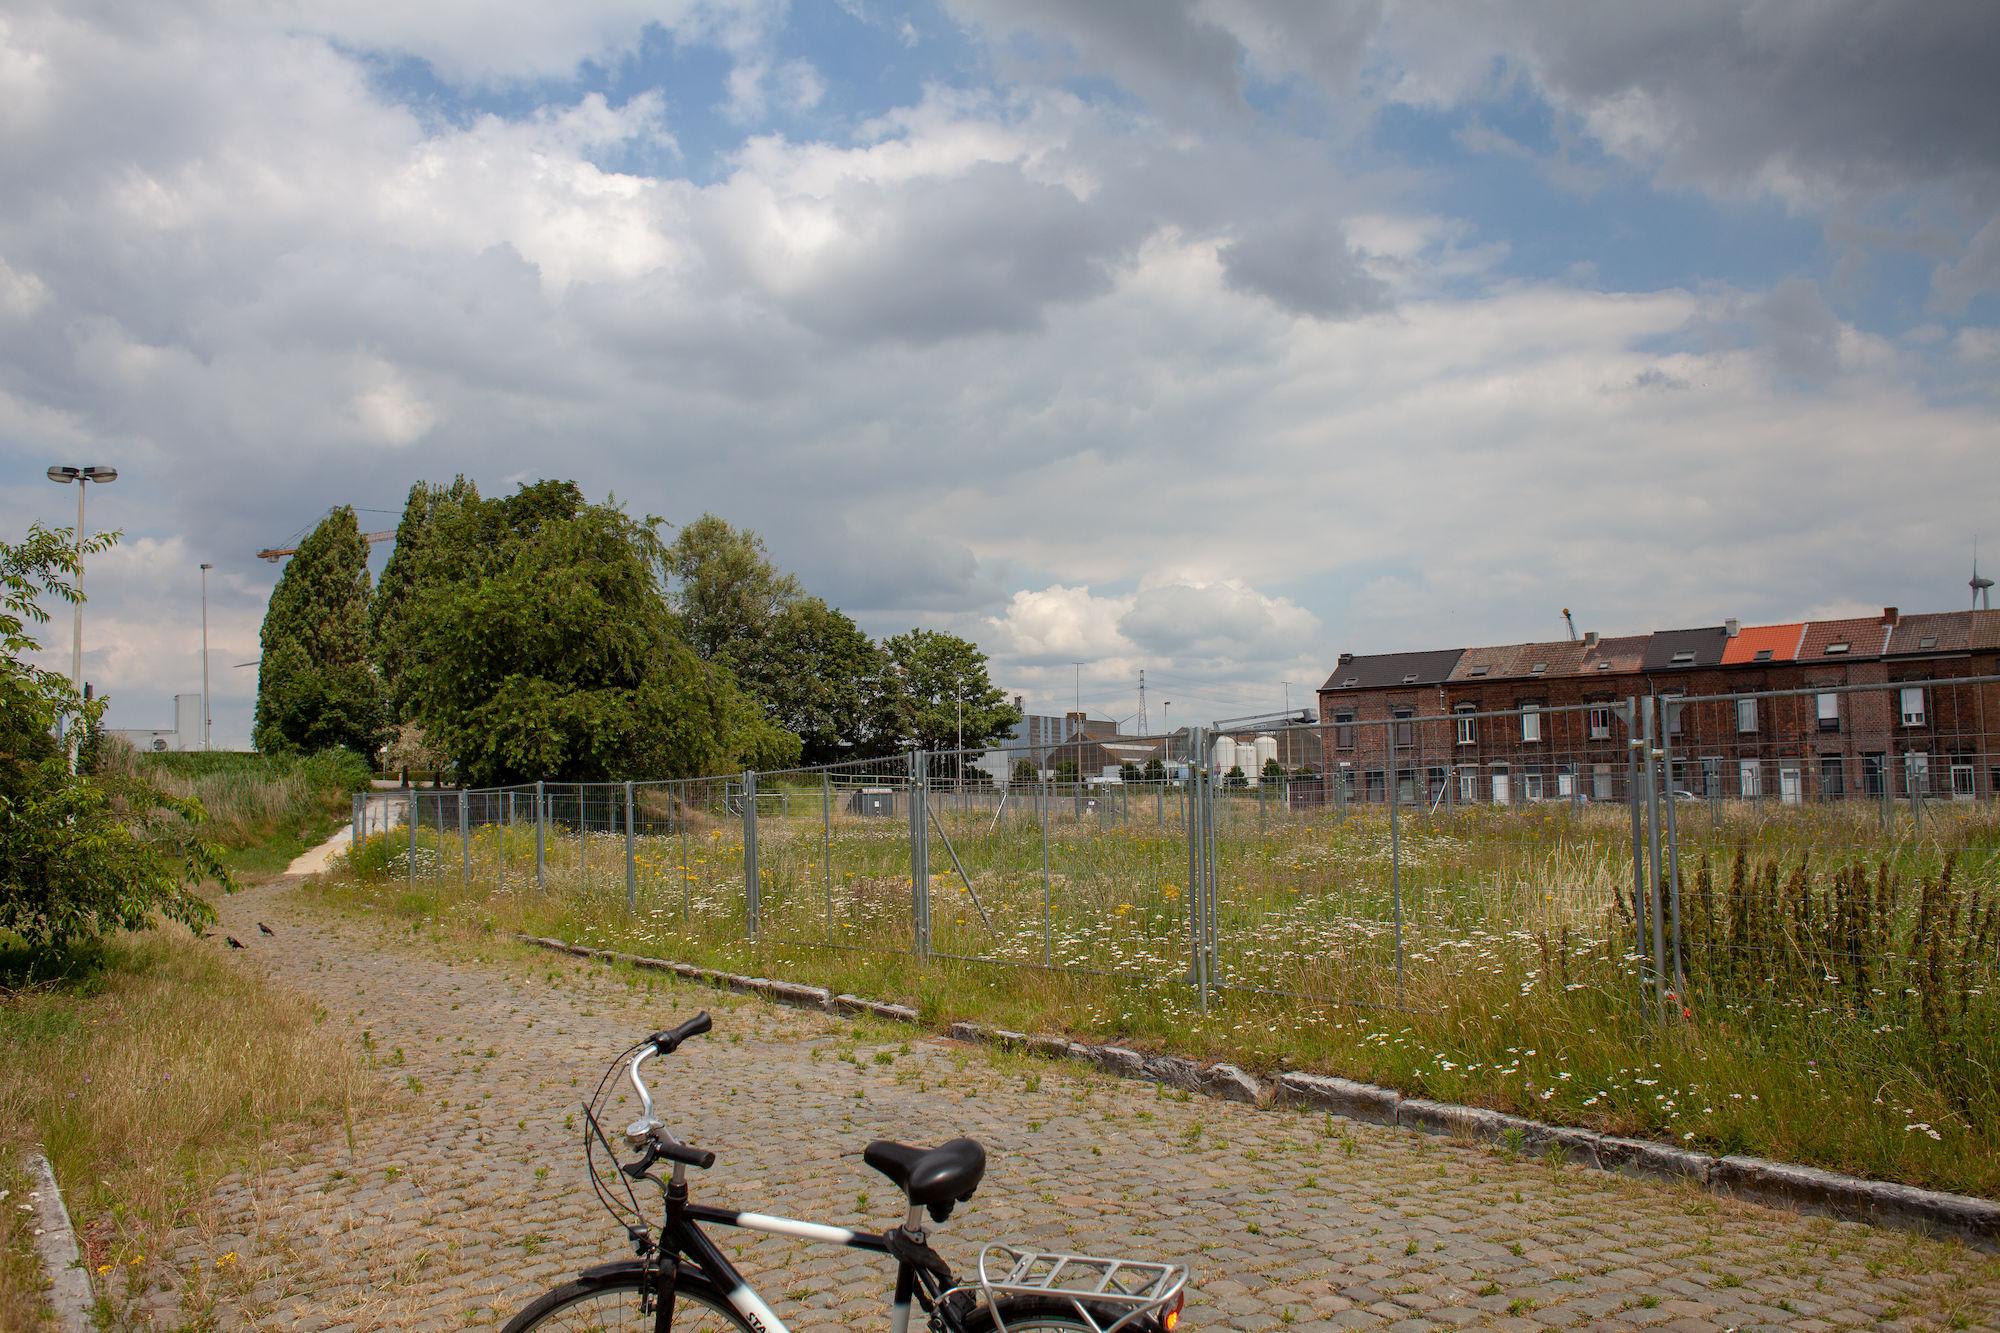 2019-07-02 Muide Meulestede prospectie Wannes_stadsvernieuwing_IMG_0376-3.jpg